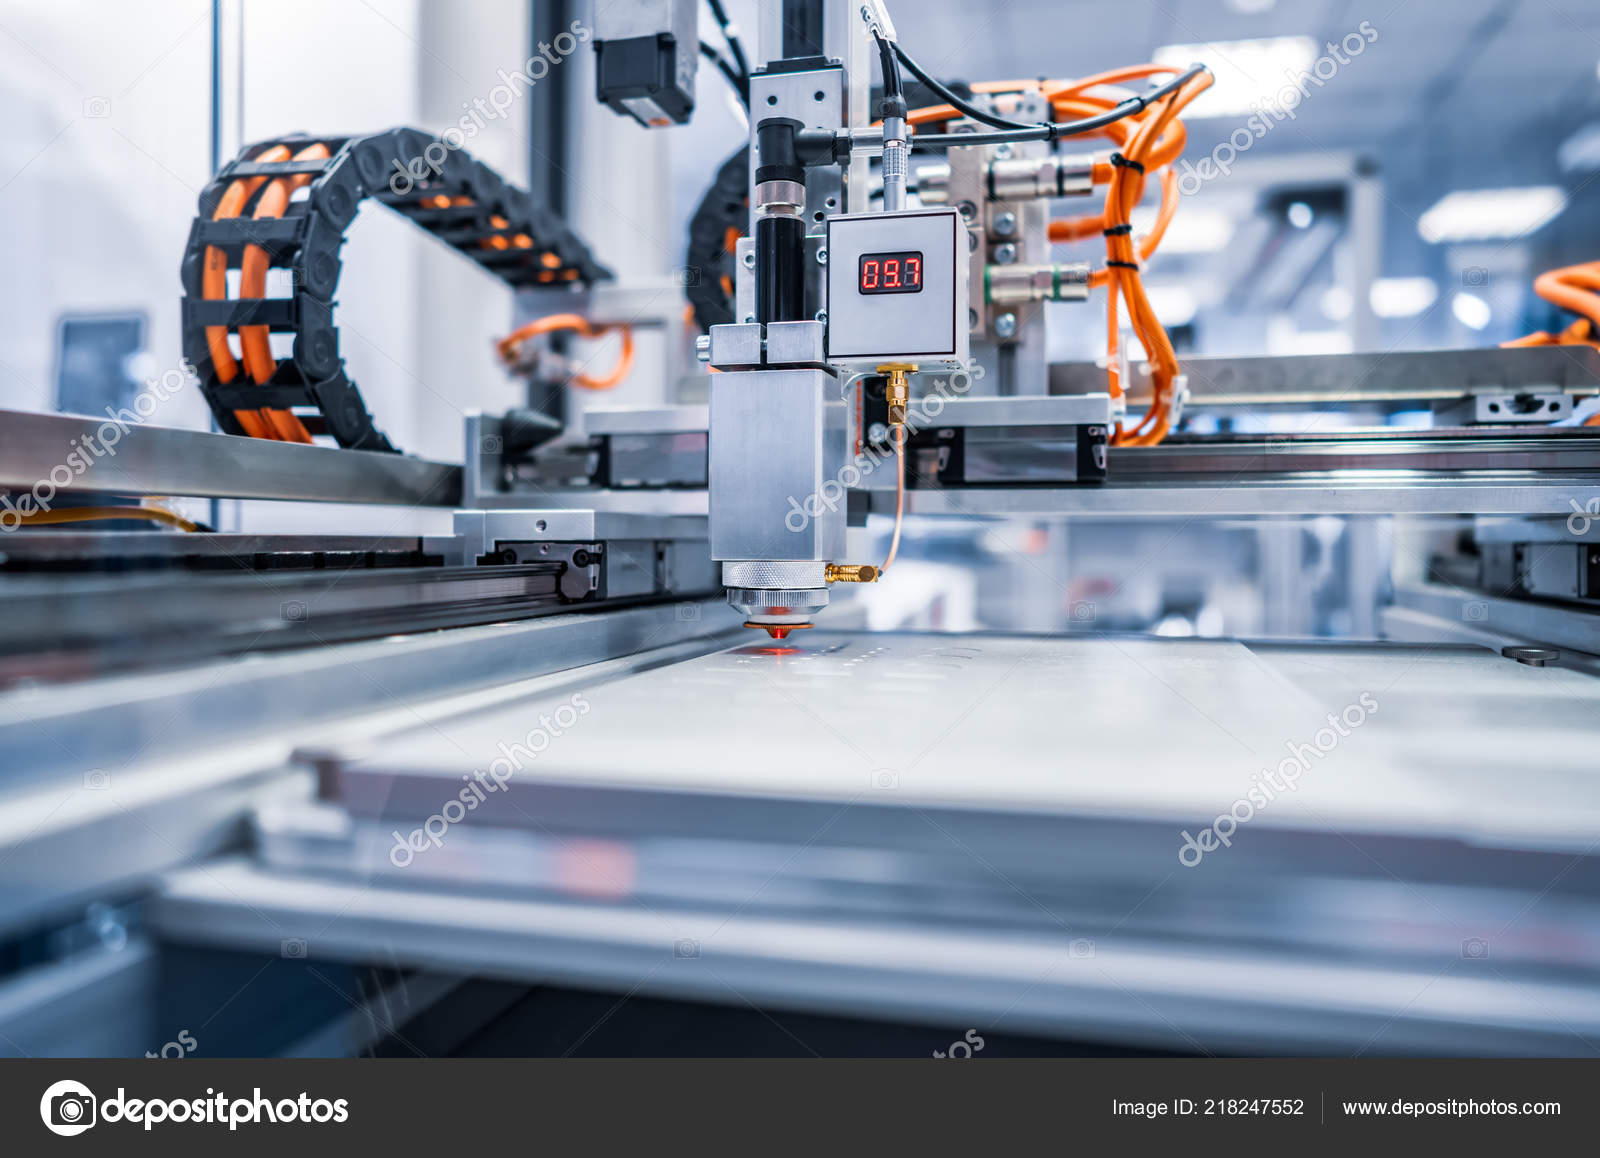 Cnc Laser Cutting Metal Modern Industrial Technology Small